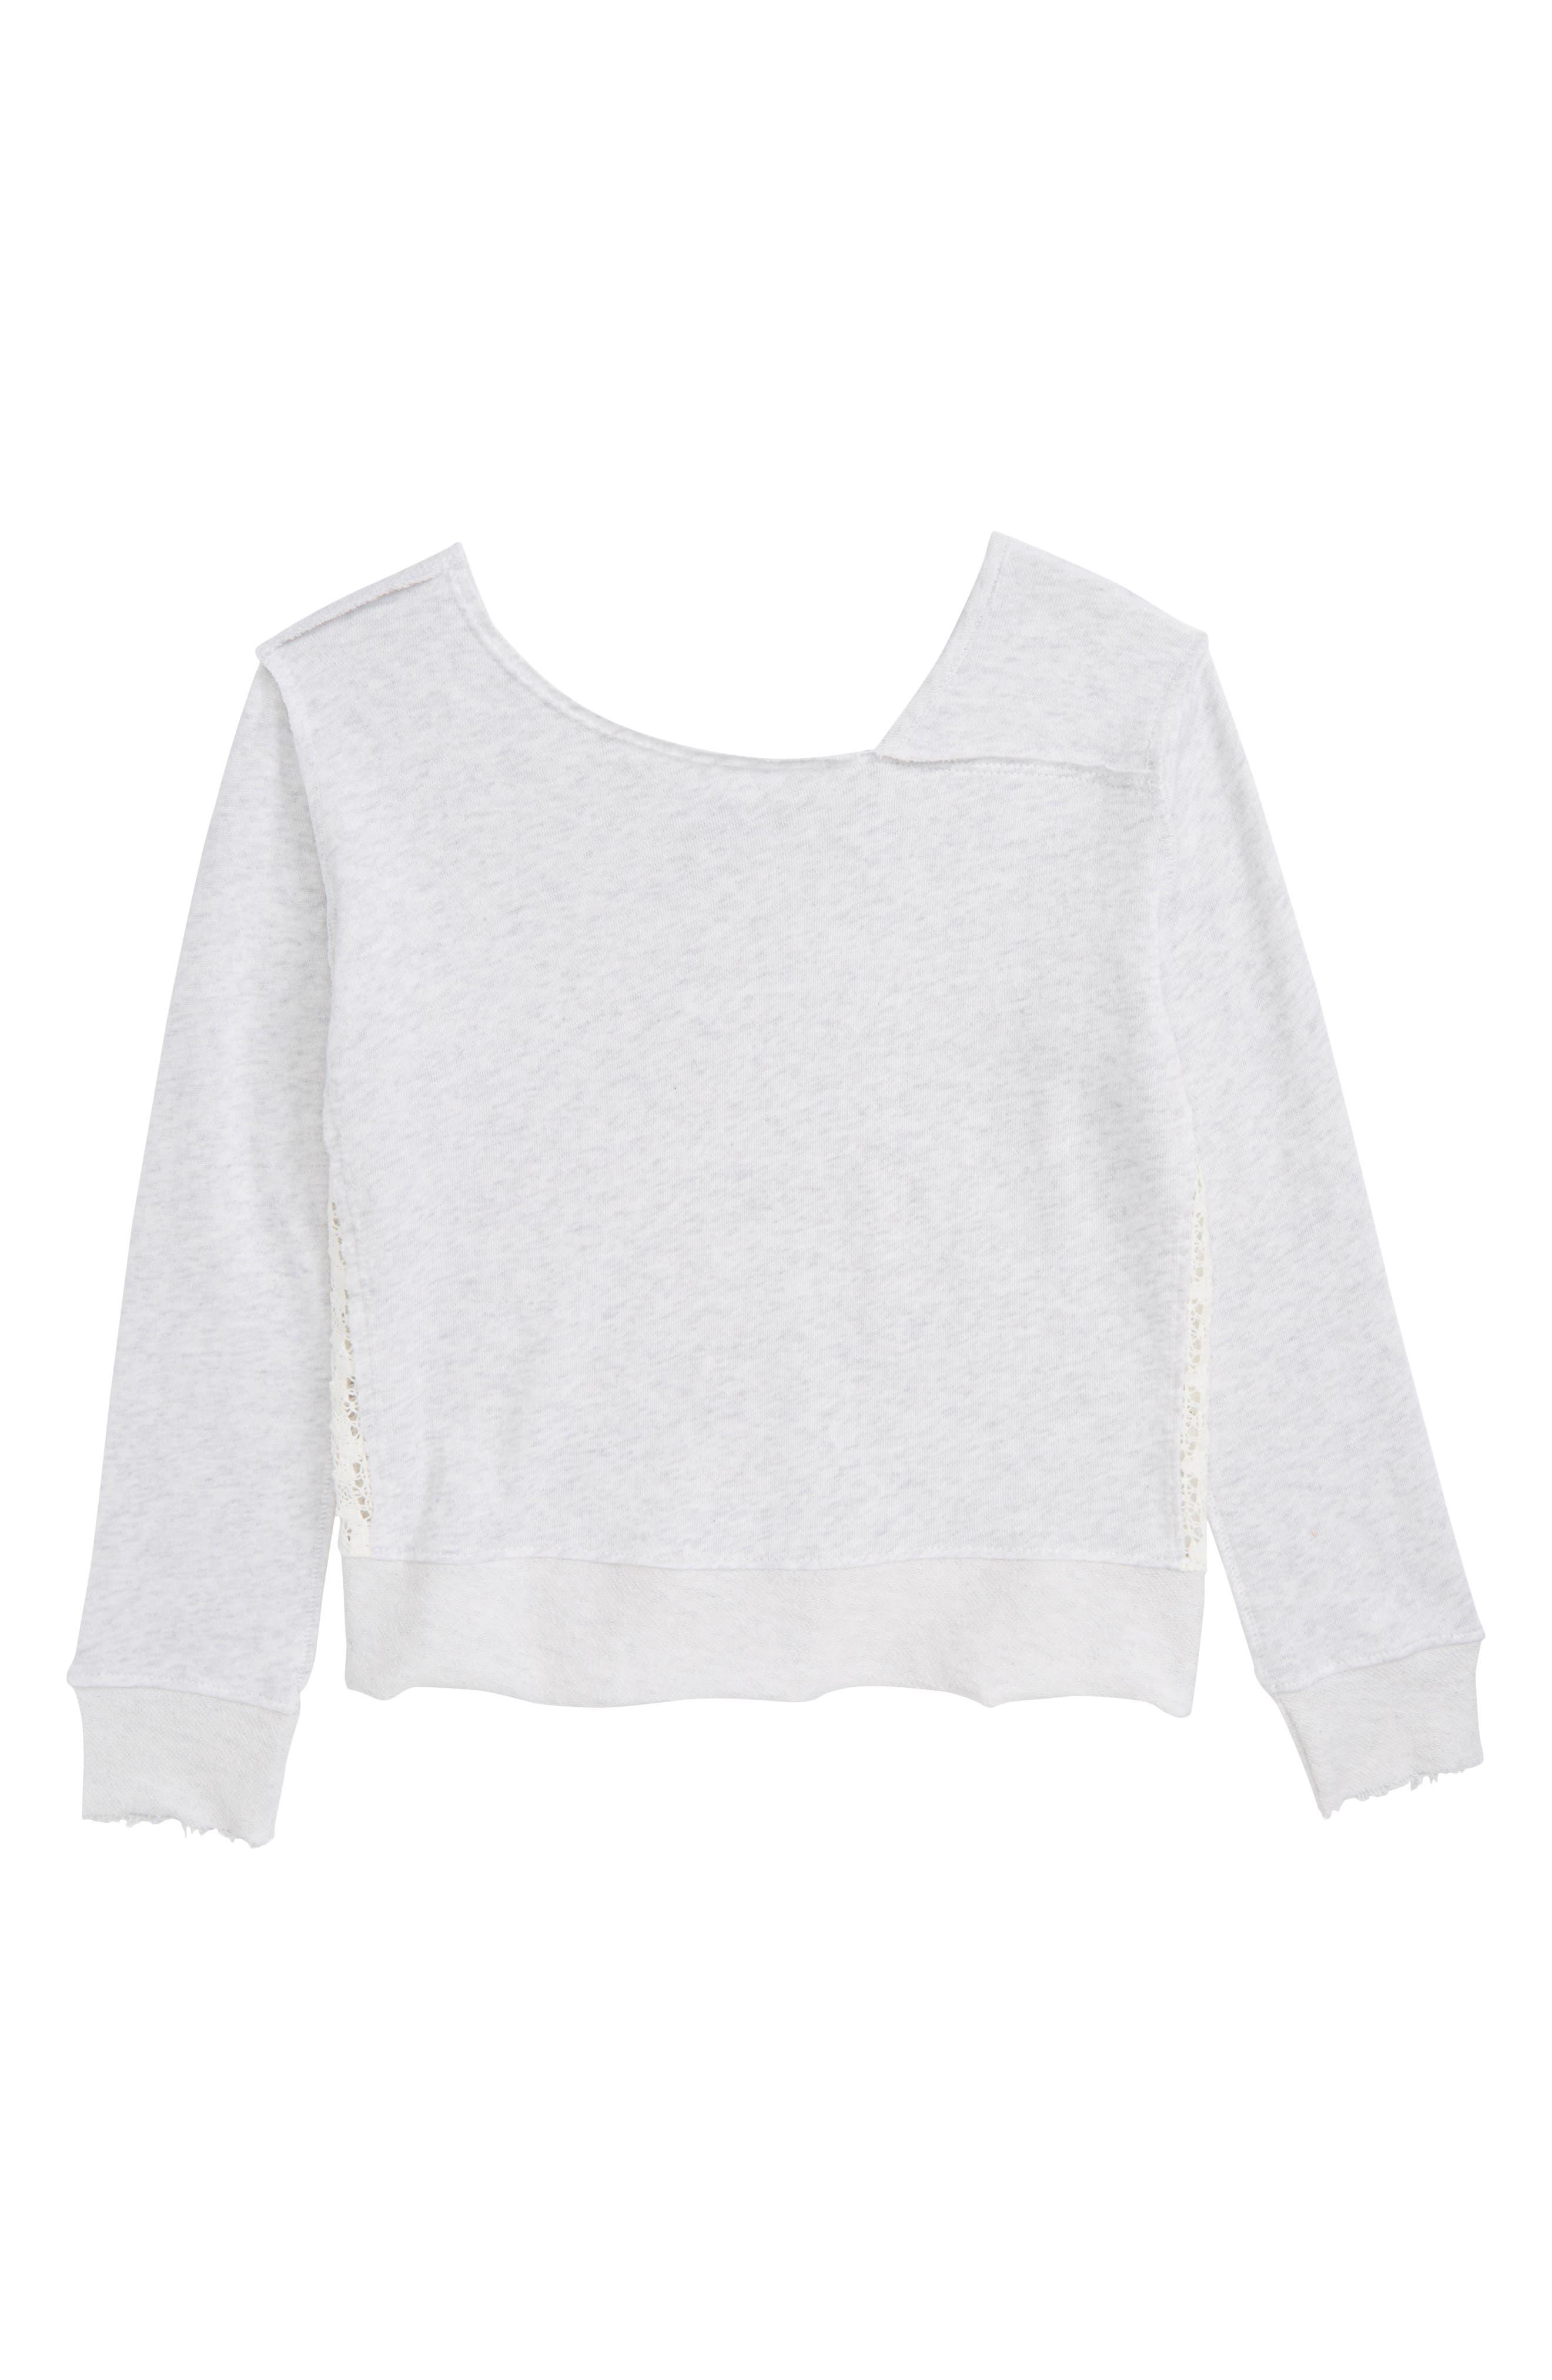 Main Image - Splendid Lace Inset Sweatshirt (Big Girls)